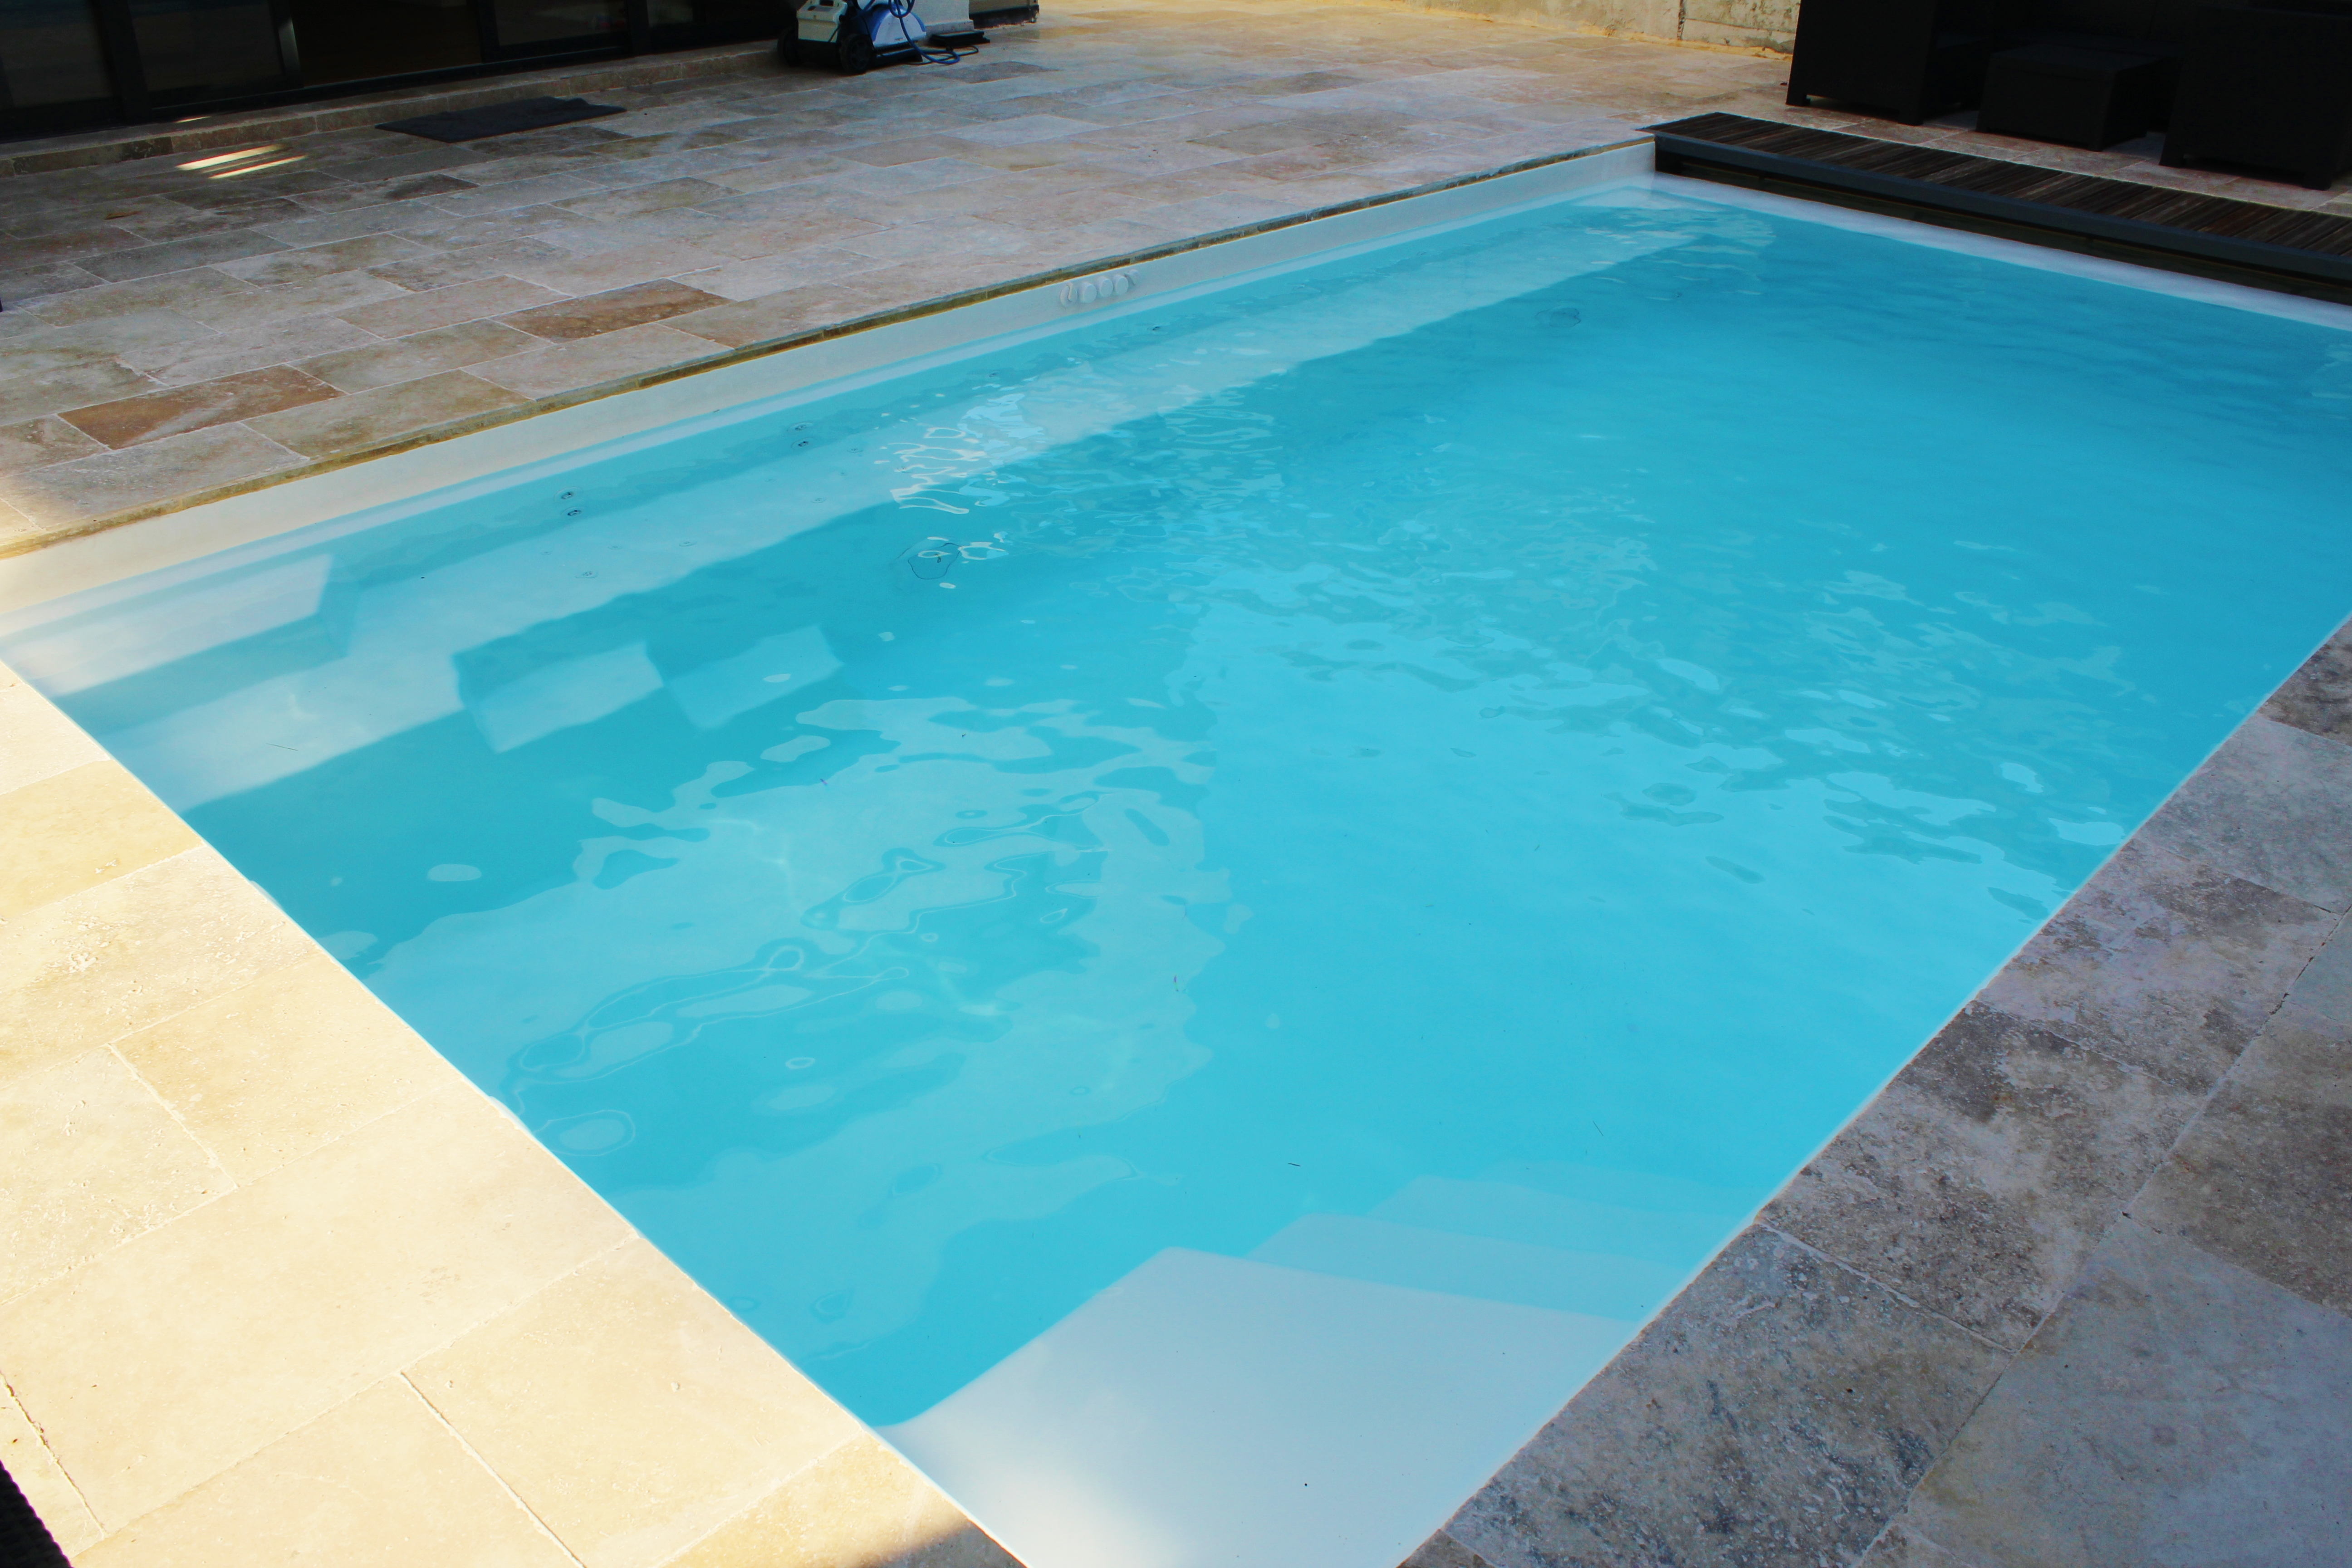 Piscines coque polyester 79 85 44 la bonne piscine for Piscine coque polyester charente maritime